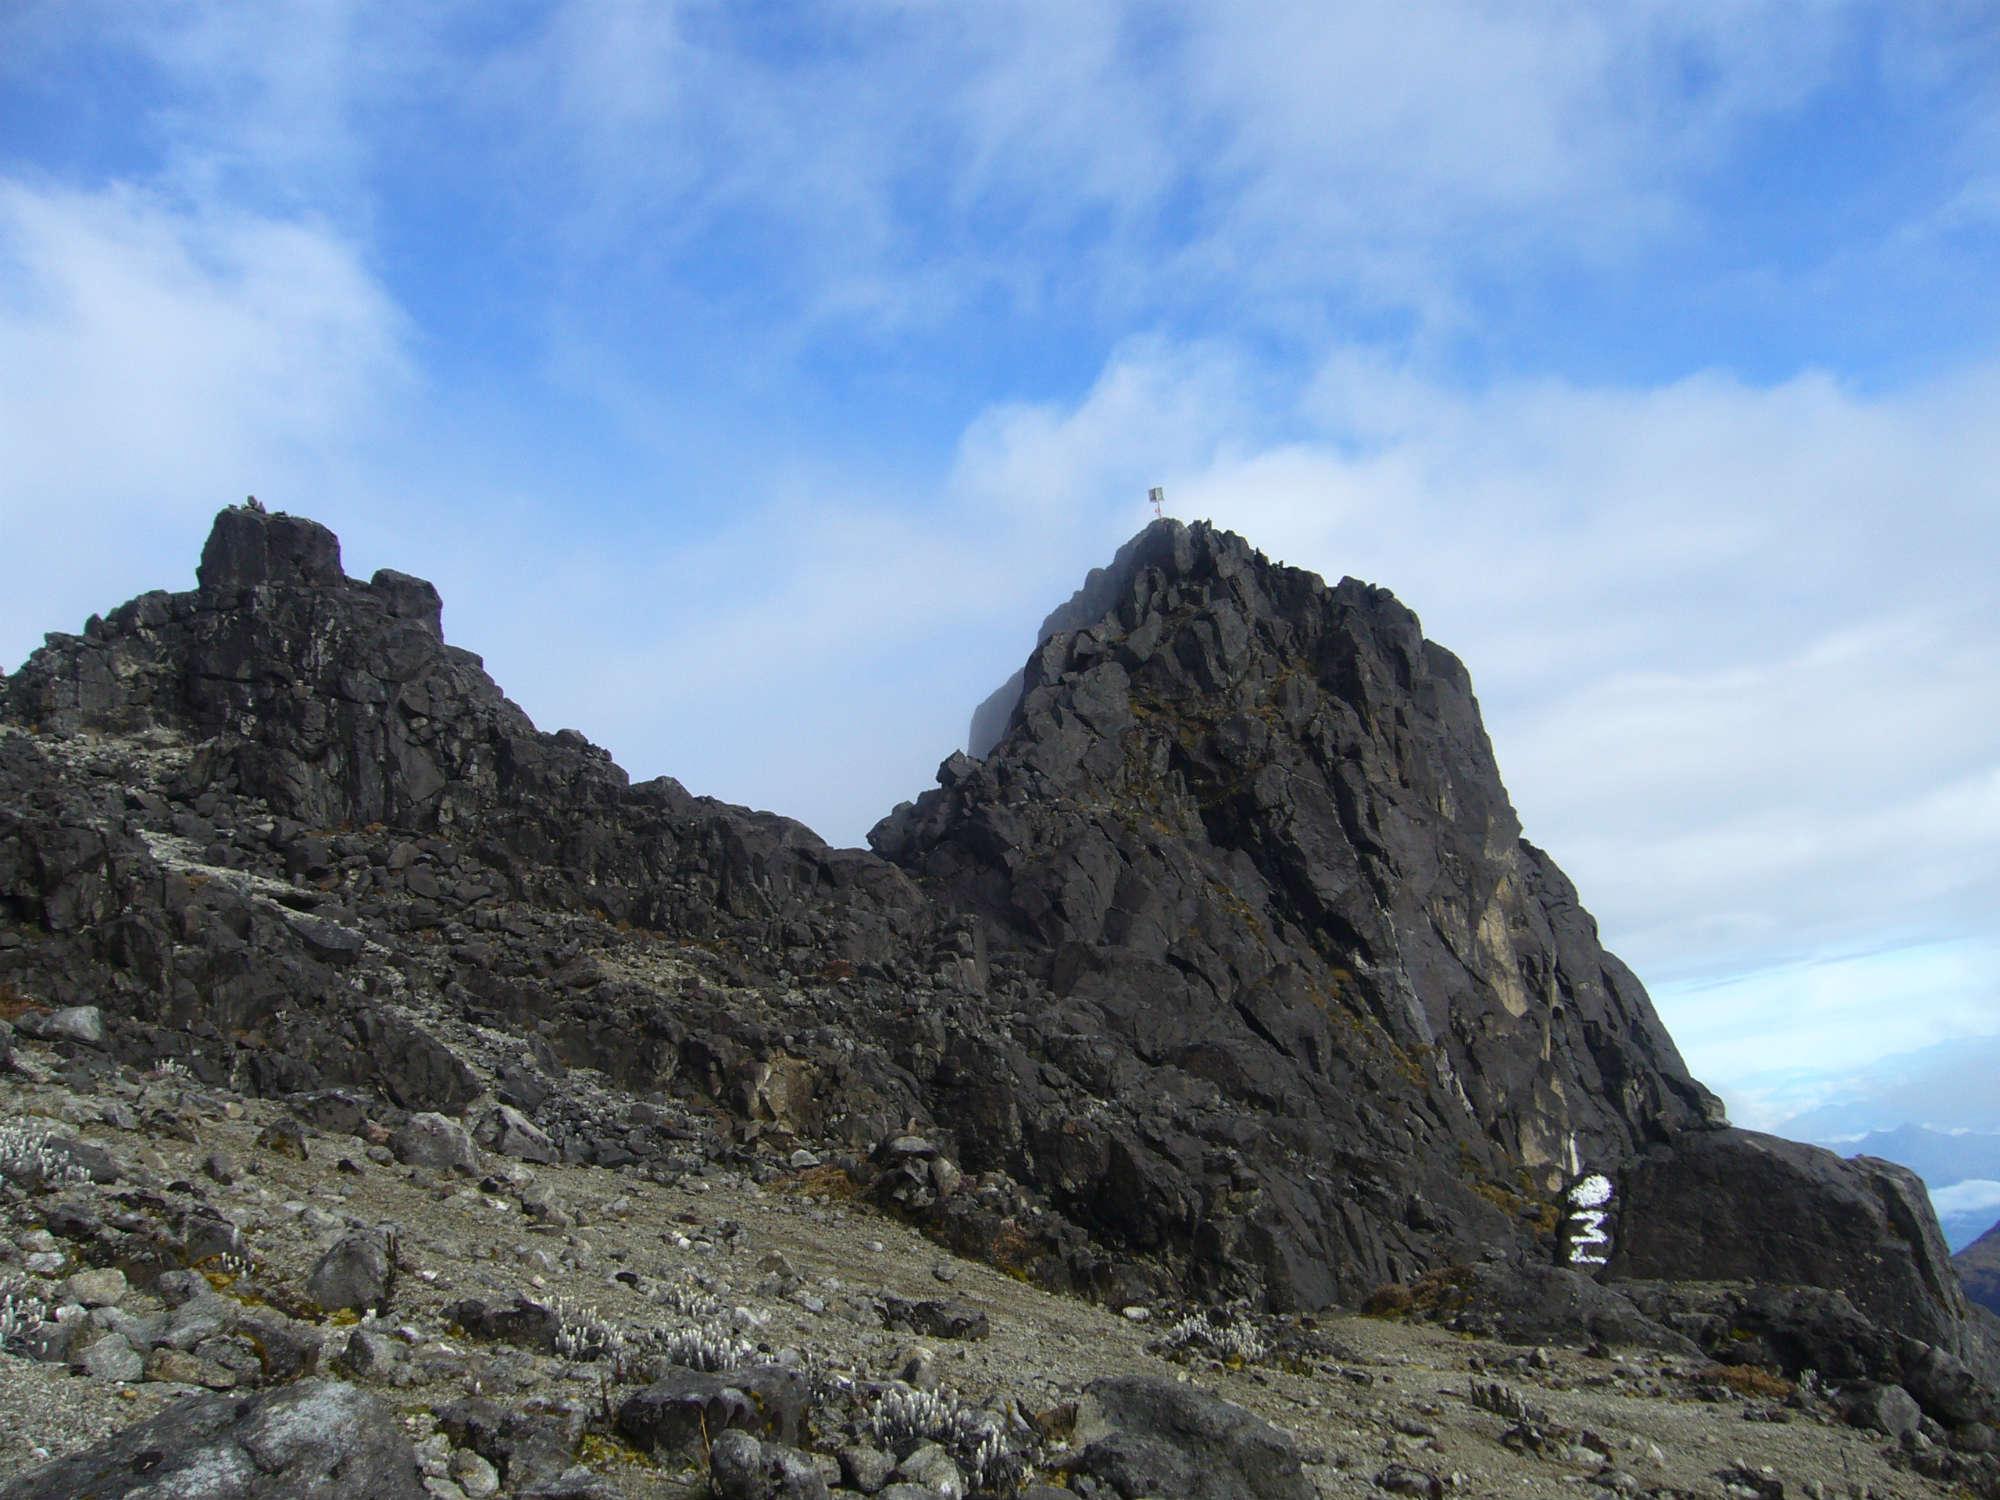 PNG・ウイルヘルム登頂8日間